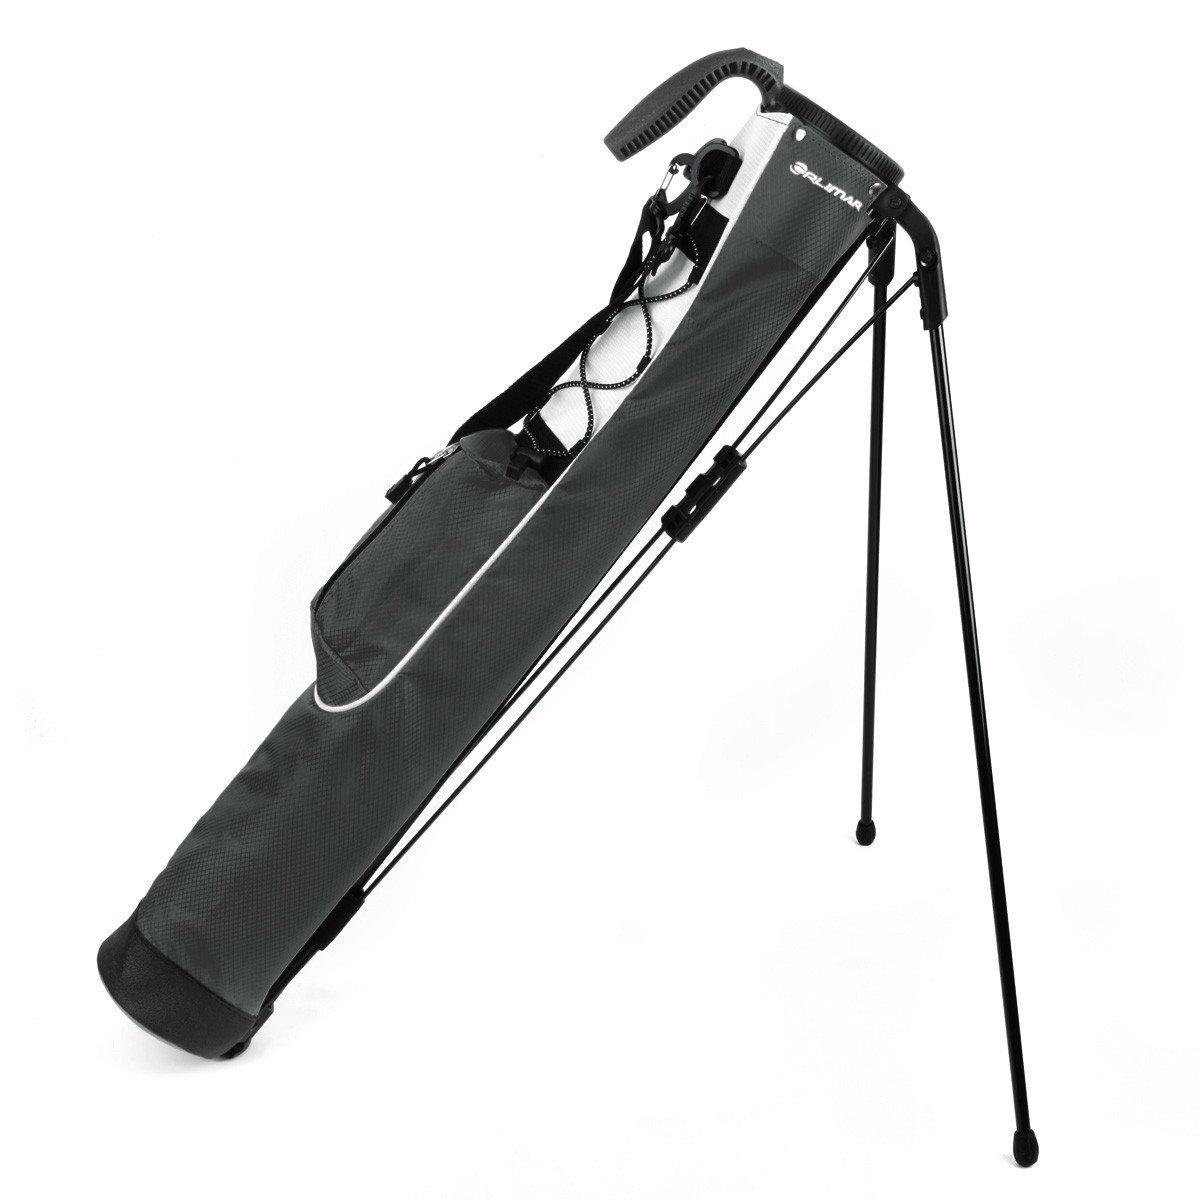 Orlimar Pitch & Putt Golf Lightweight Stand Carry Bag, Slate Grey